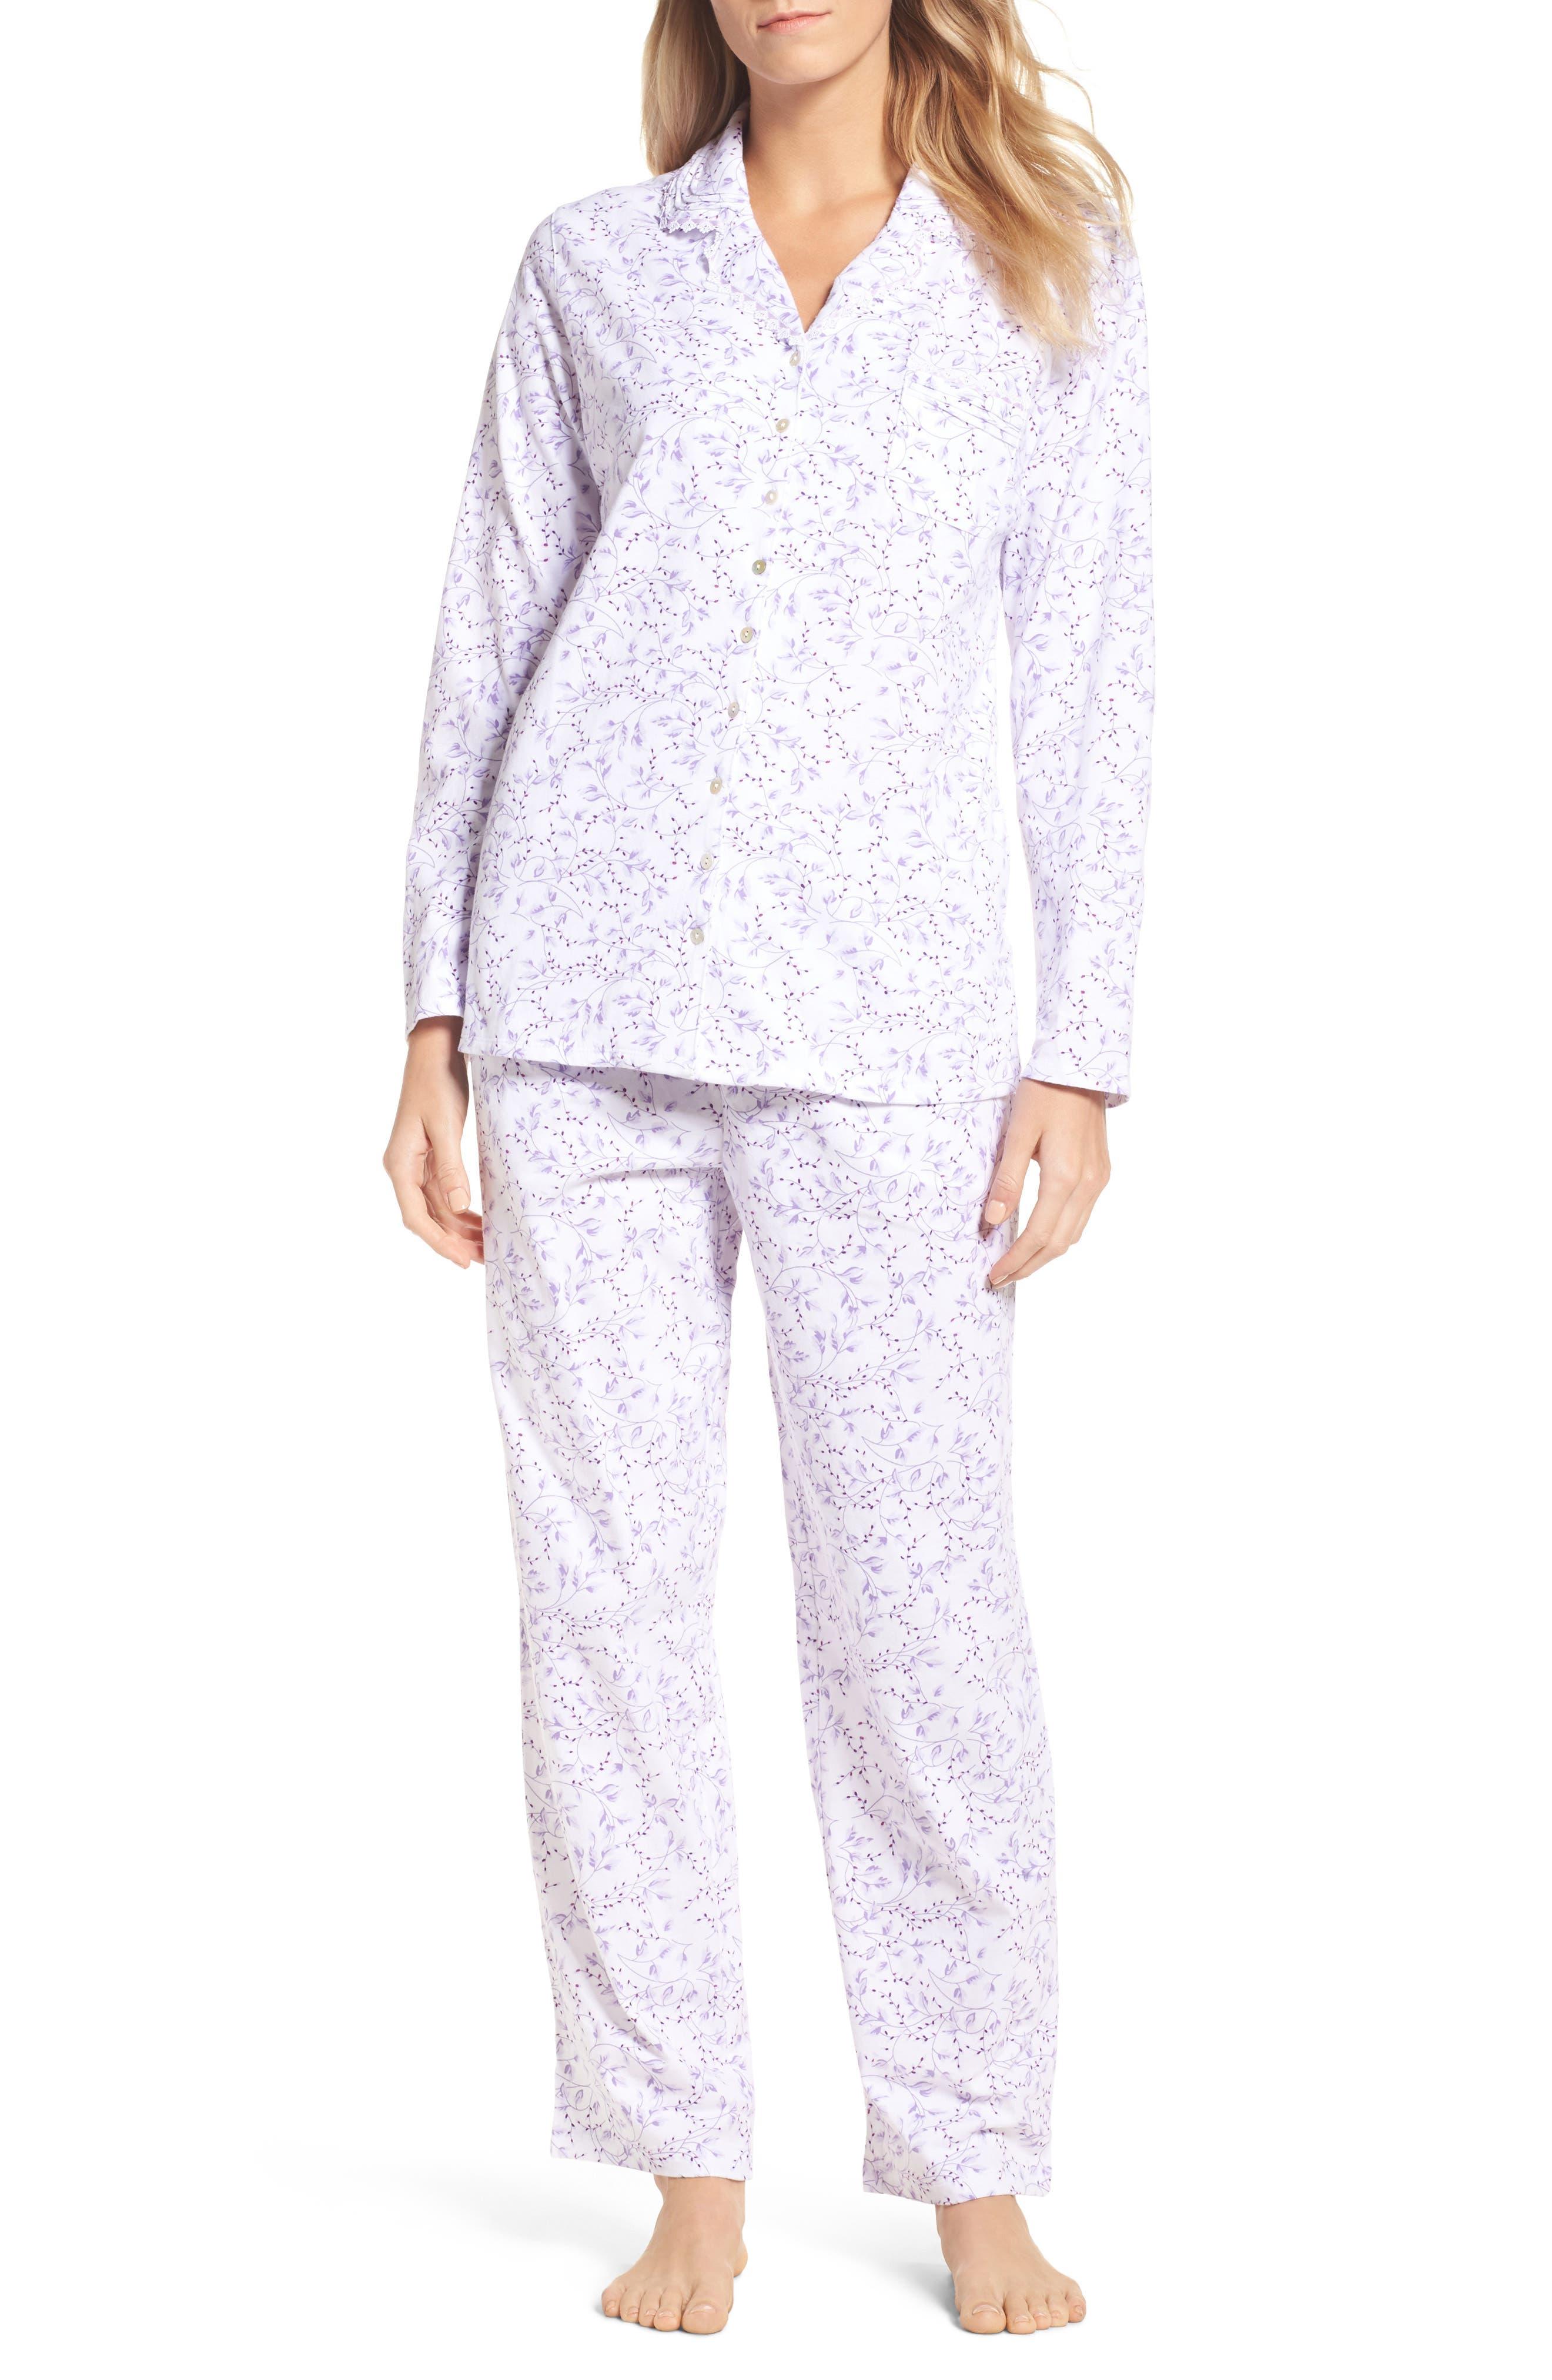 Notch Collar Pajamas,                             Main thumbnail 1, color,                             110